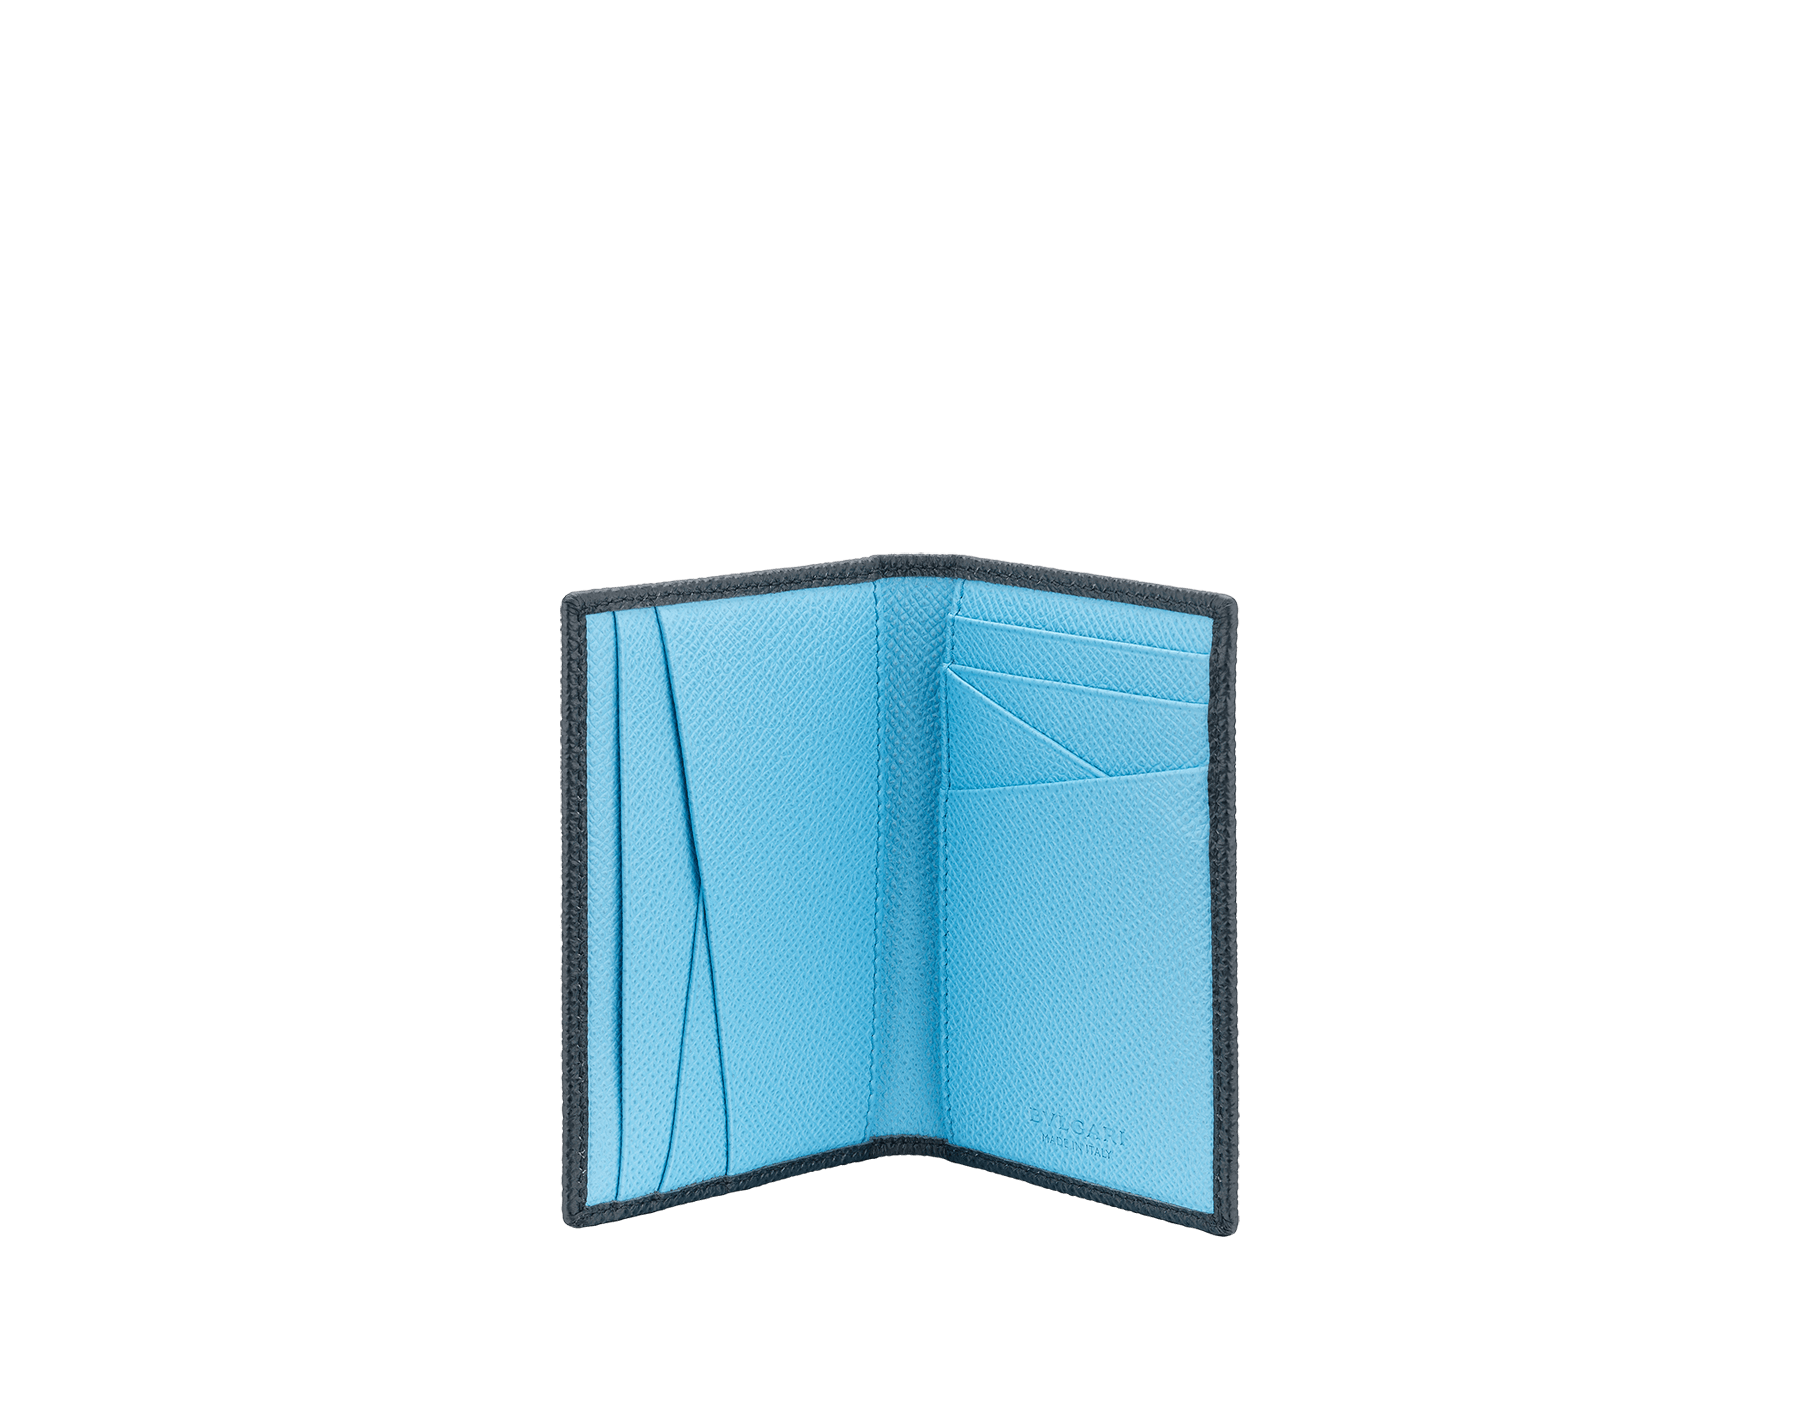 """BVLGARI BVLGARI MAN"" bi-fold card holder in Charcoal Diamond grey and light Aegean Topaz blue grained calfskin. BVLGARI BVLGARI embellishment in palladium-plated brass. 290660 image 2"